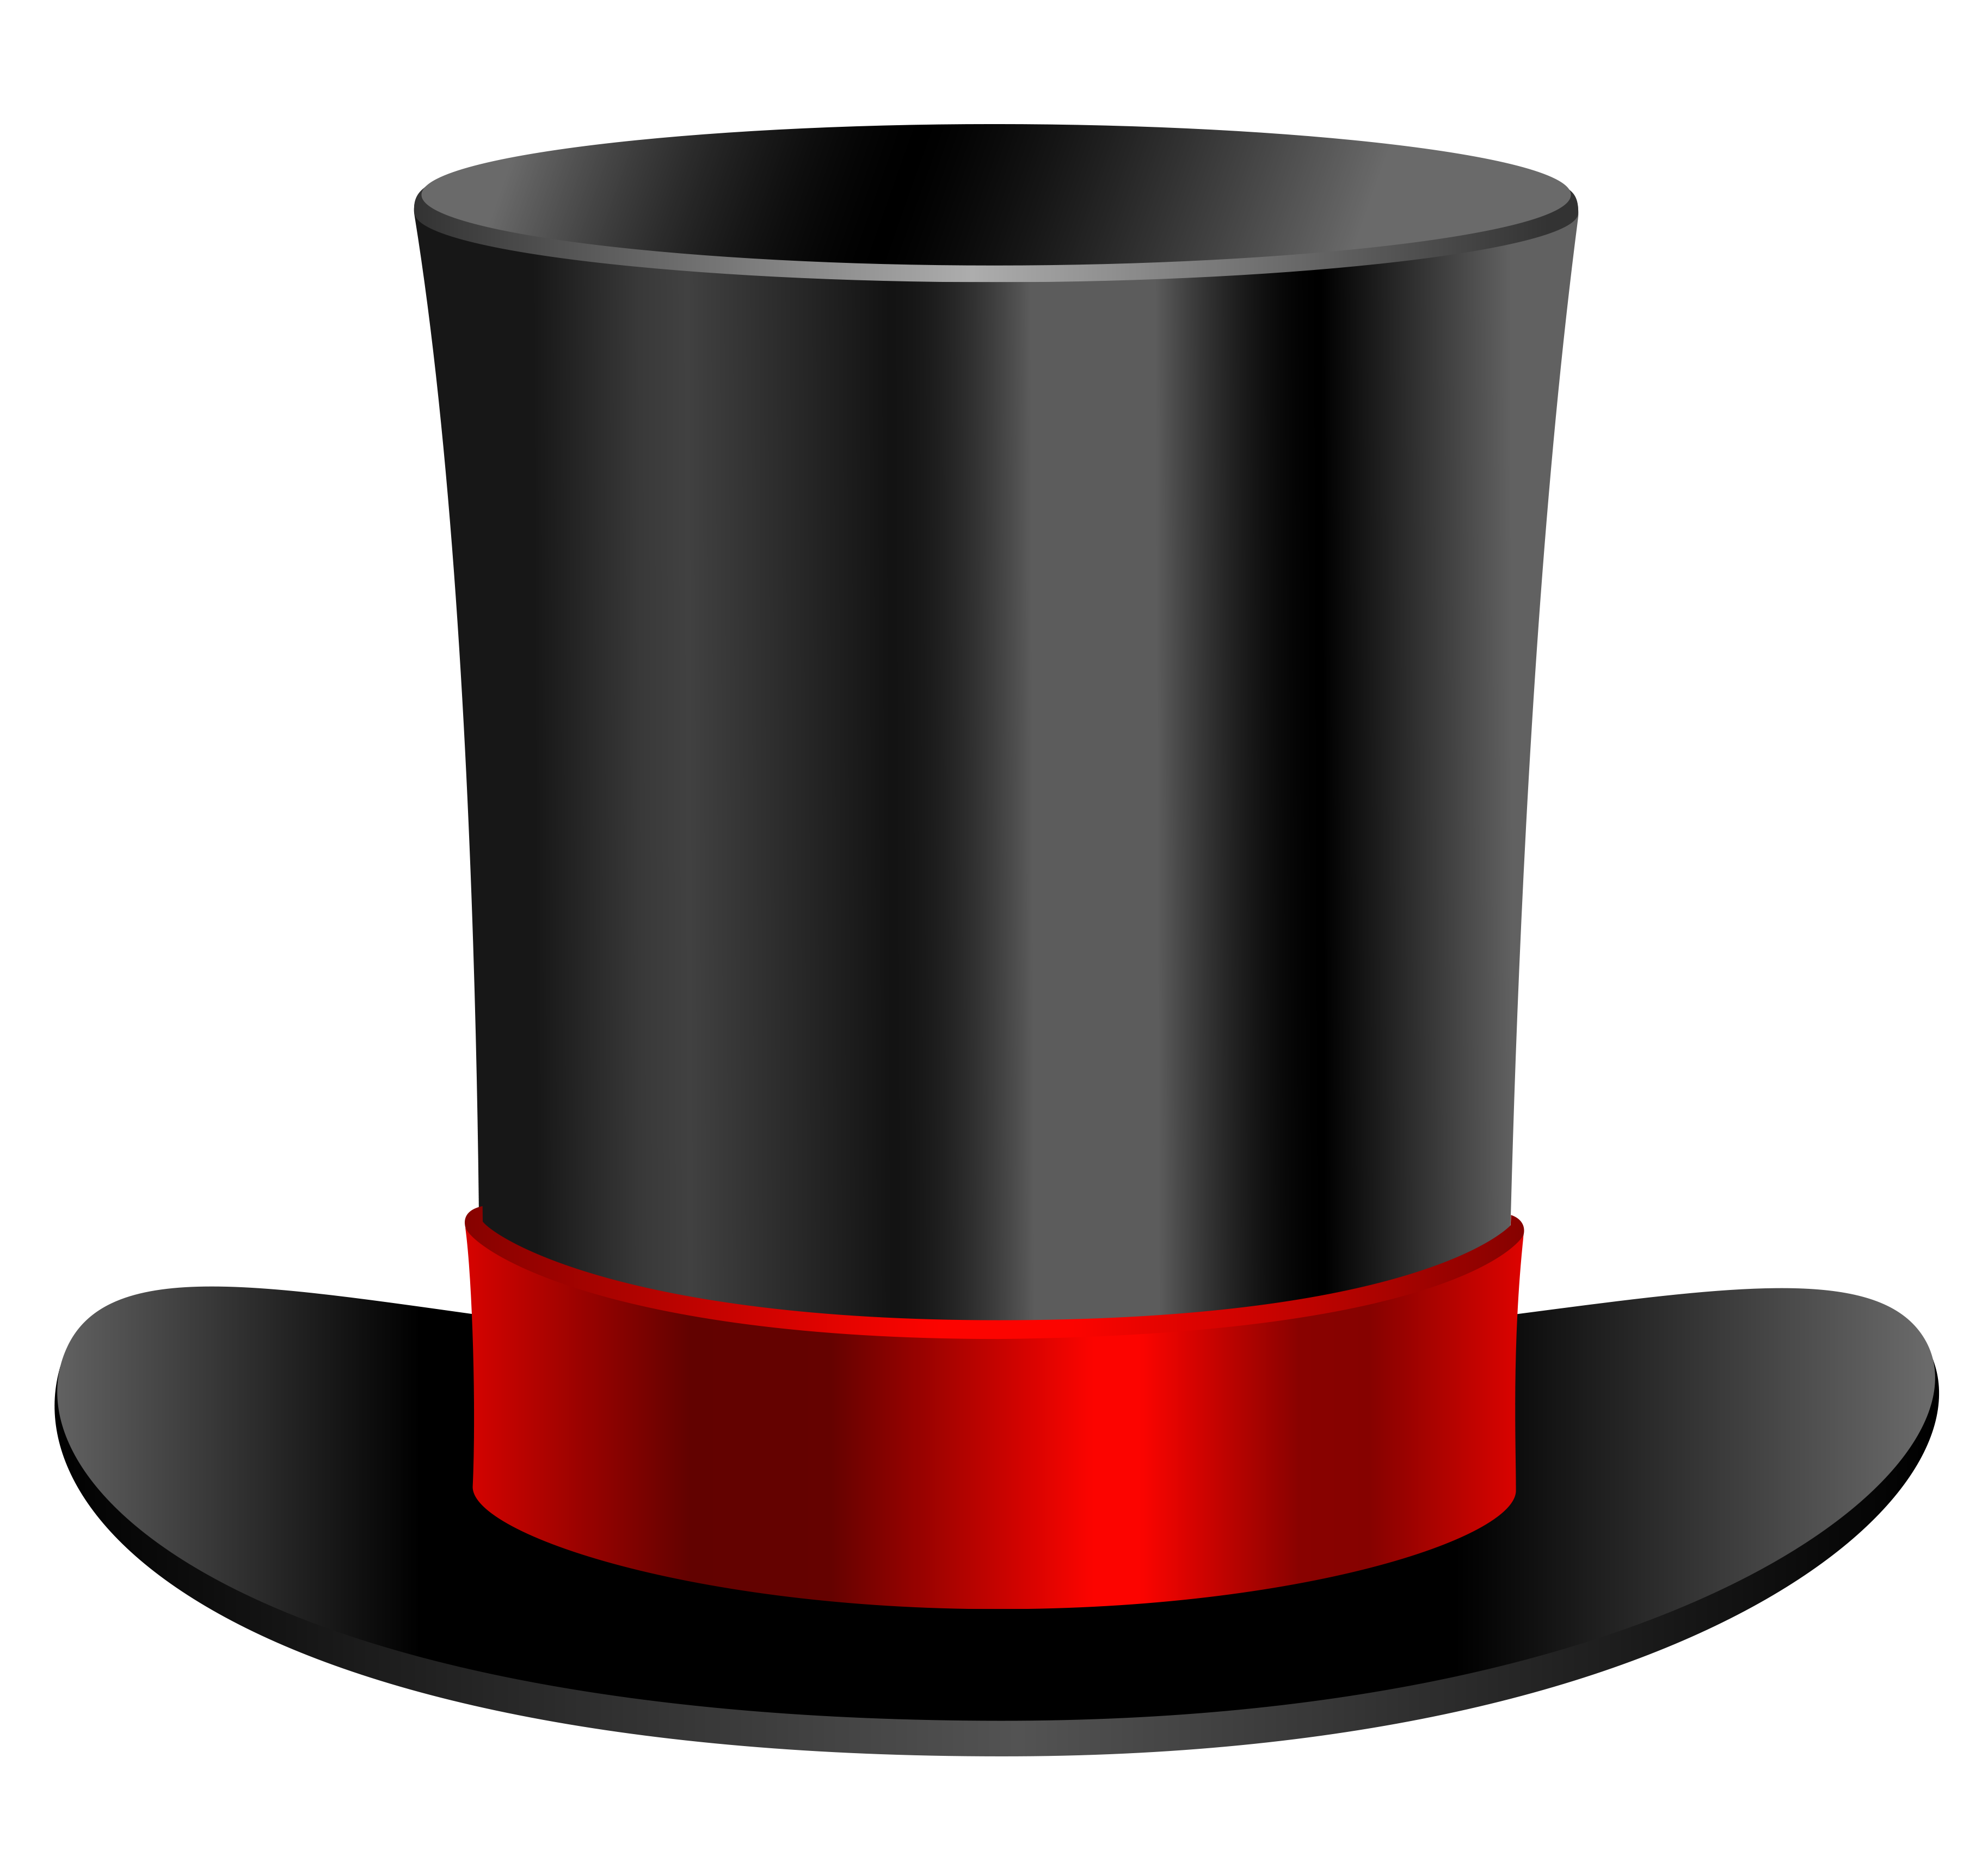 Top hat gallery yopriceville. Hats clipart valentine